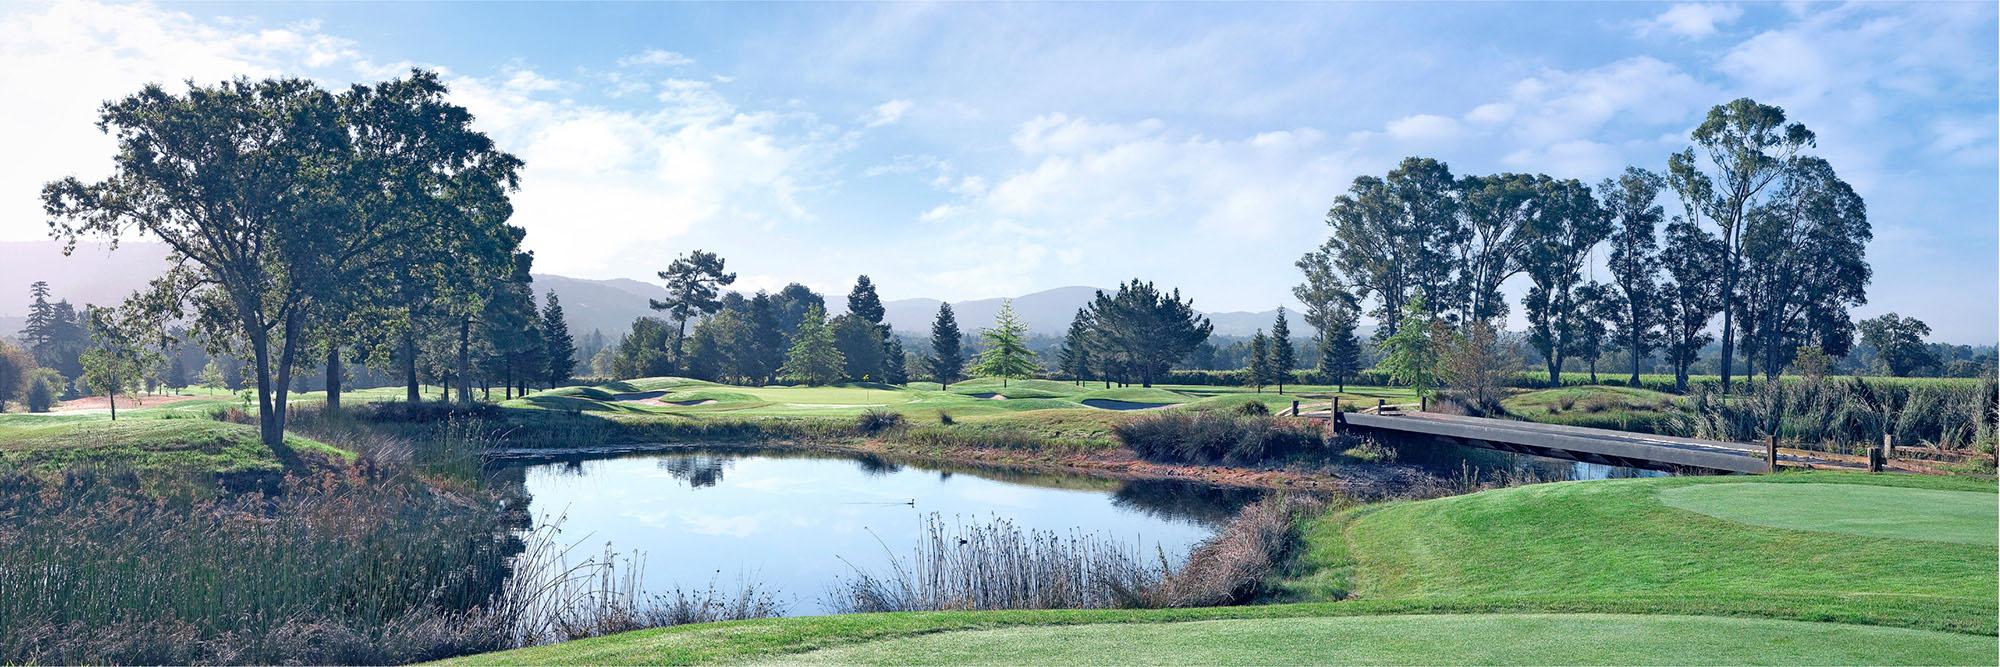 Golf Course Image - Sonoma No. 14